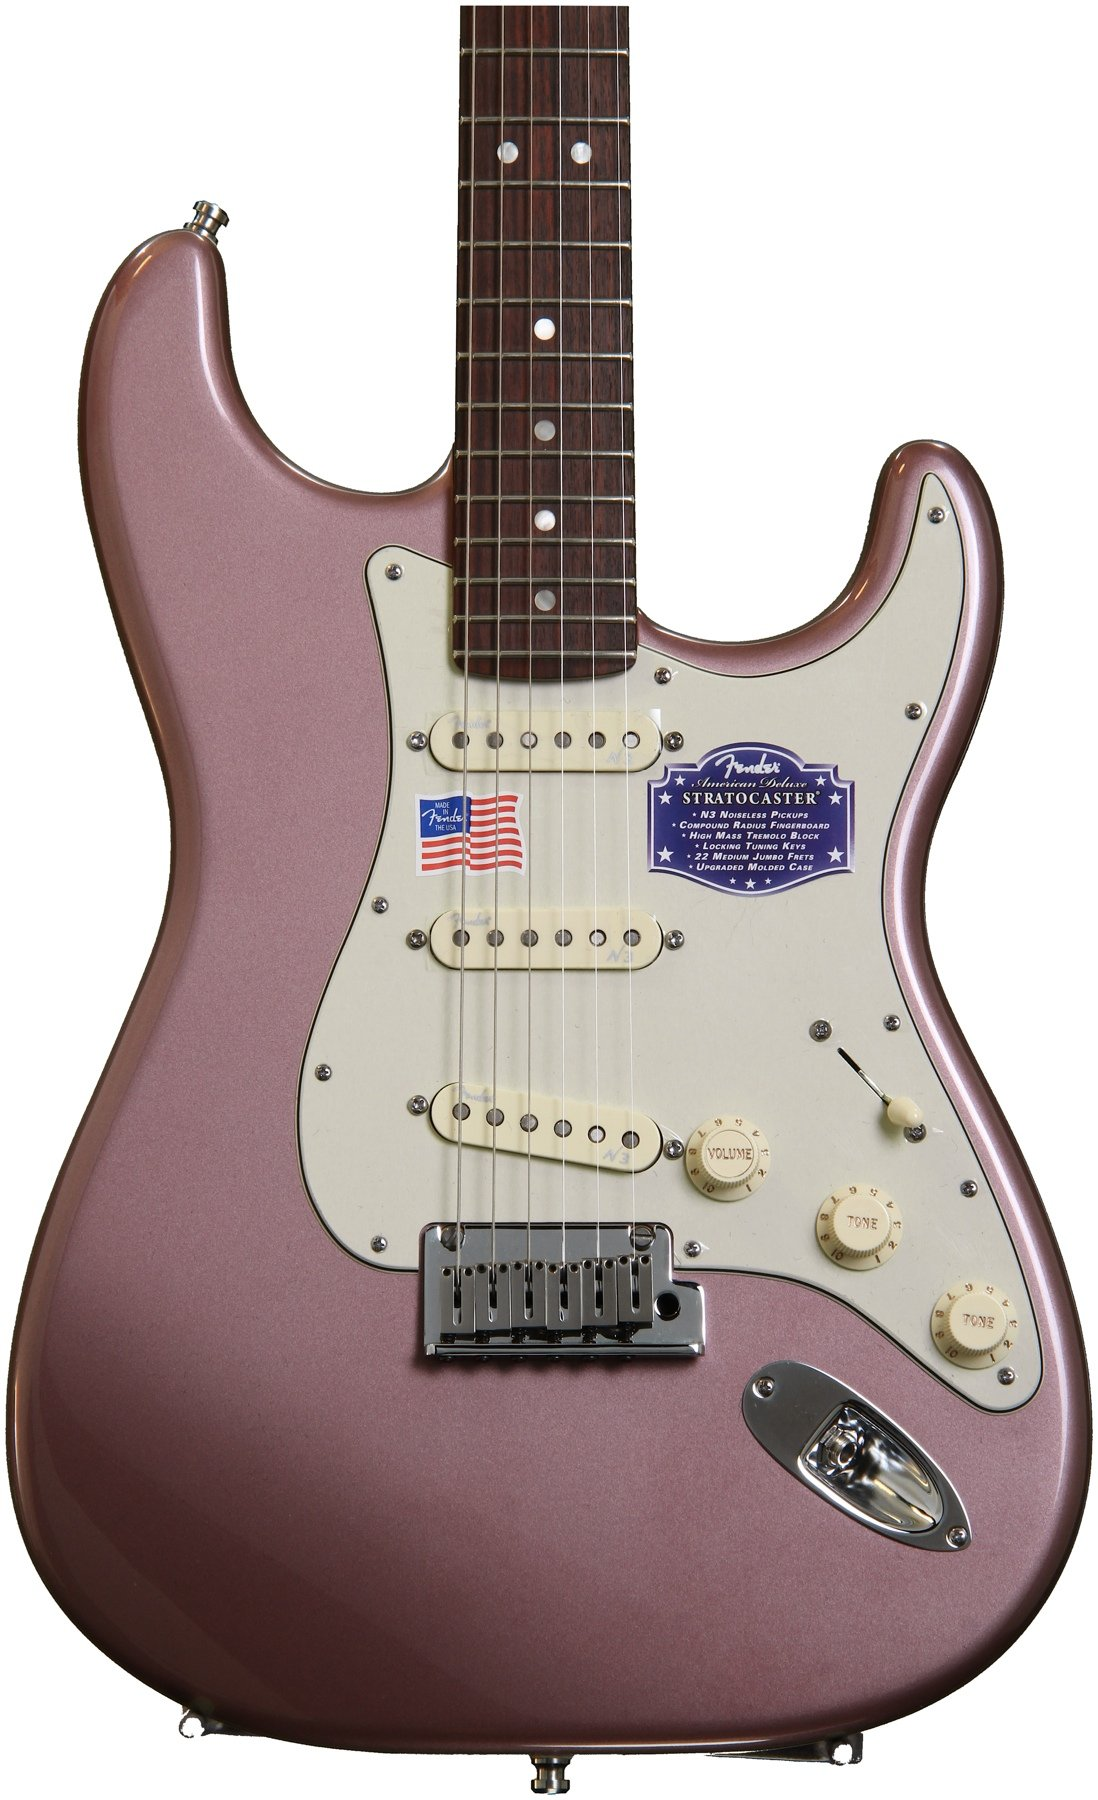 Fender Jaguar Special Hh Wiring Diagram Auto Electrical Toronado Vintage Noise Less Pickups N3